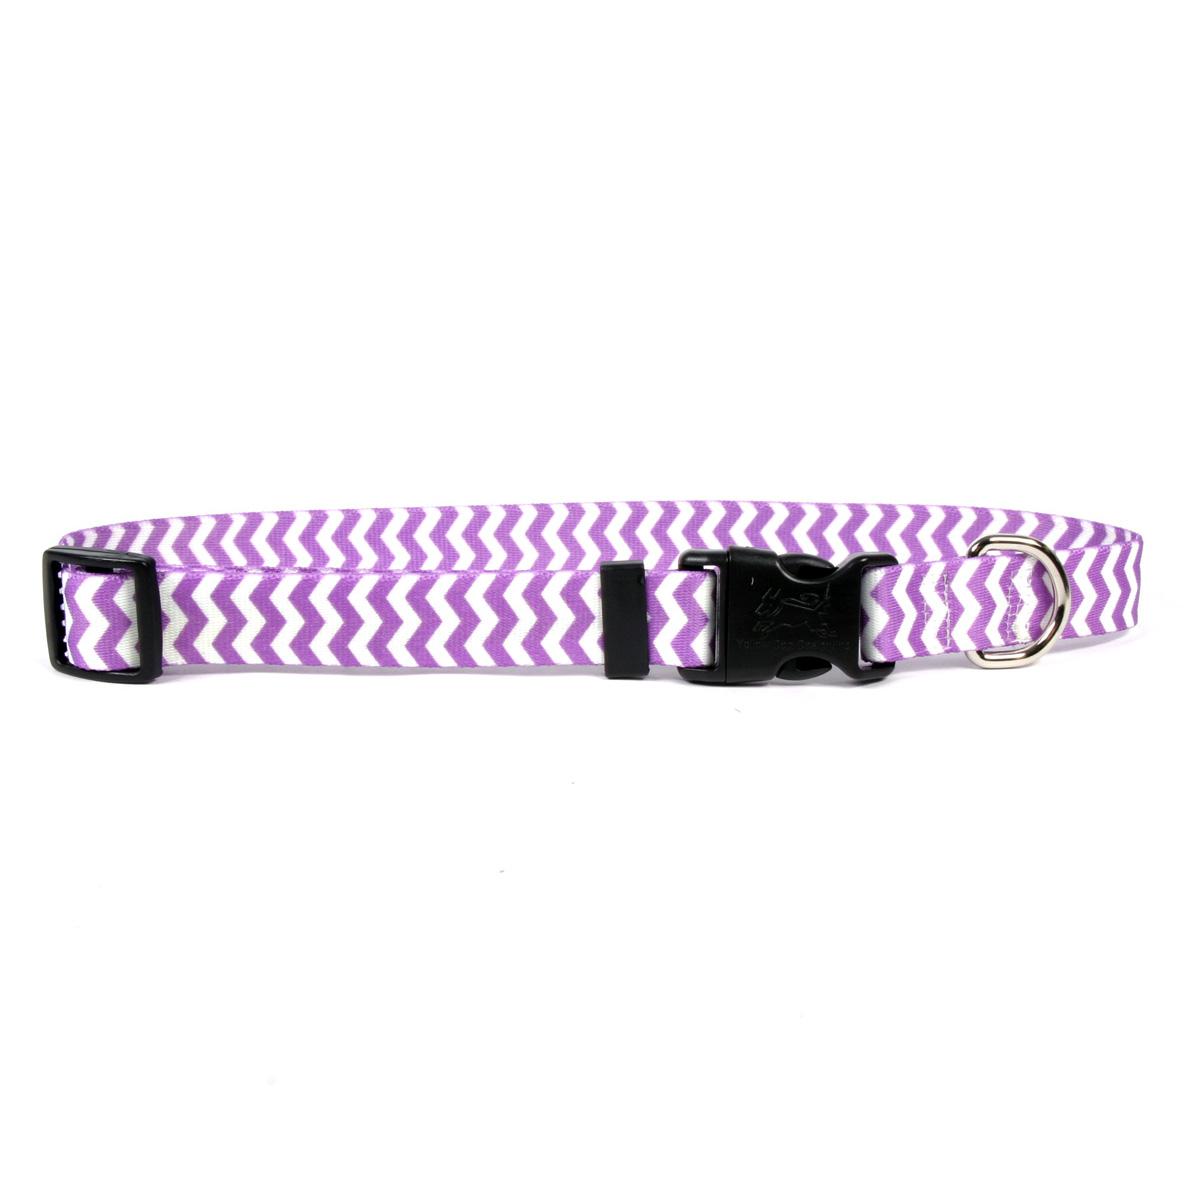 Chevron Dog Collar by Yellow Dog - Grape